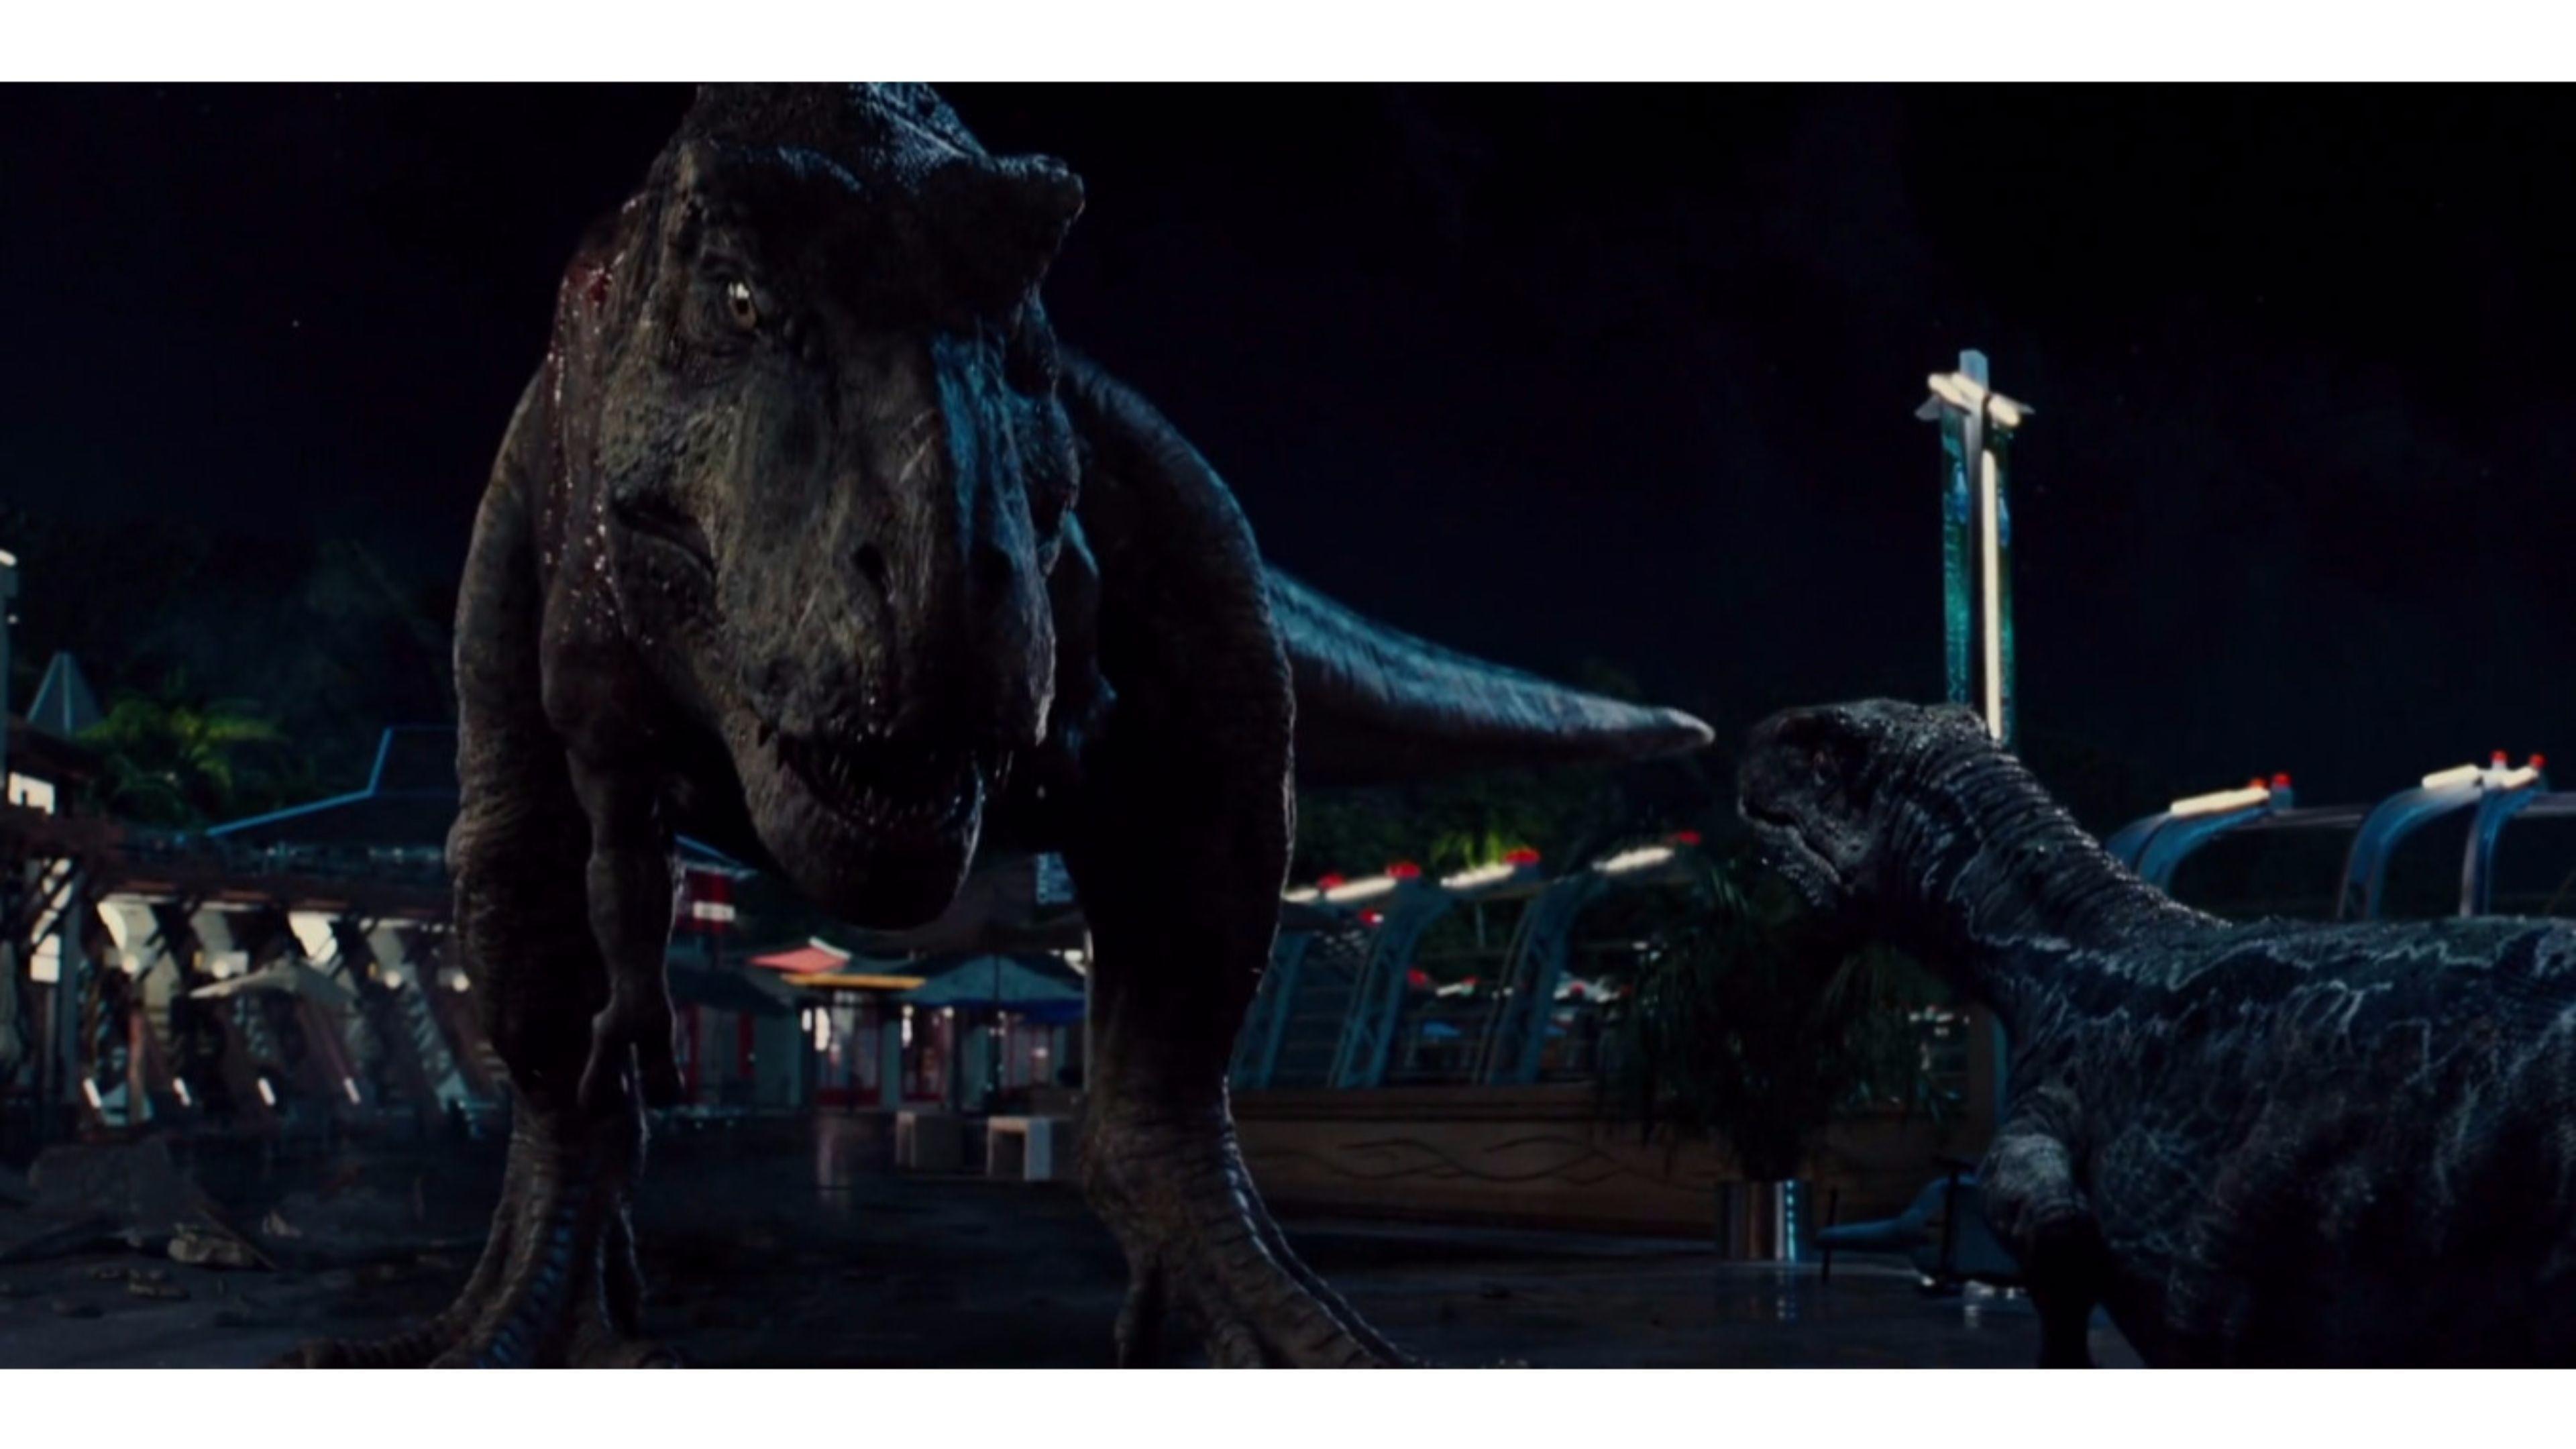 Res: 3840x2160, Creative Jurassic World 4K Wallpaper